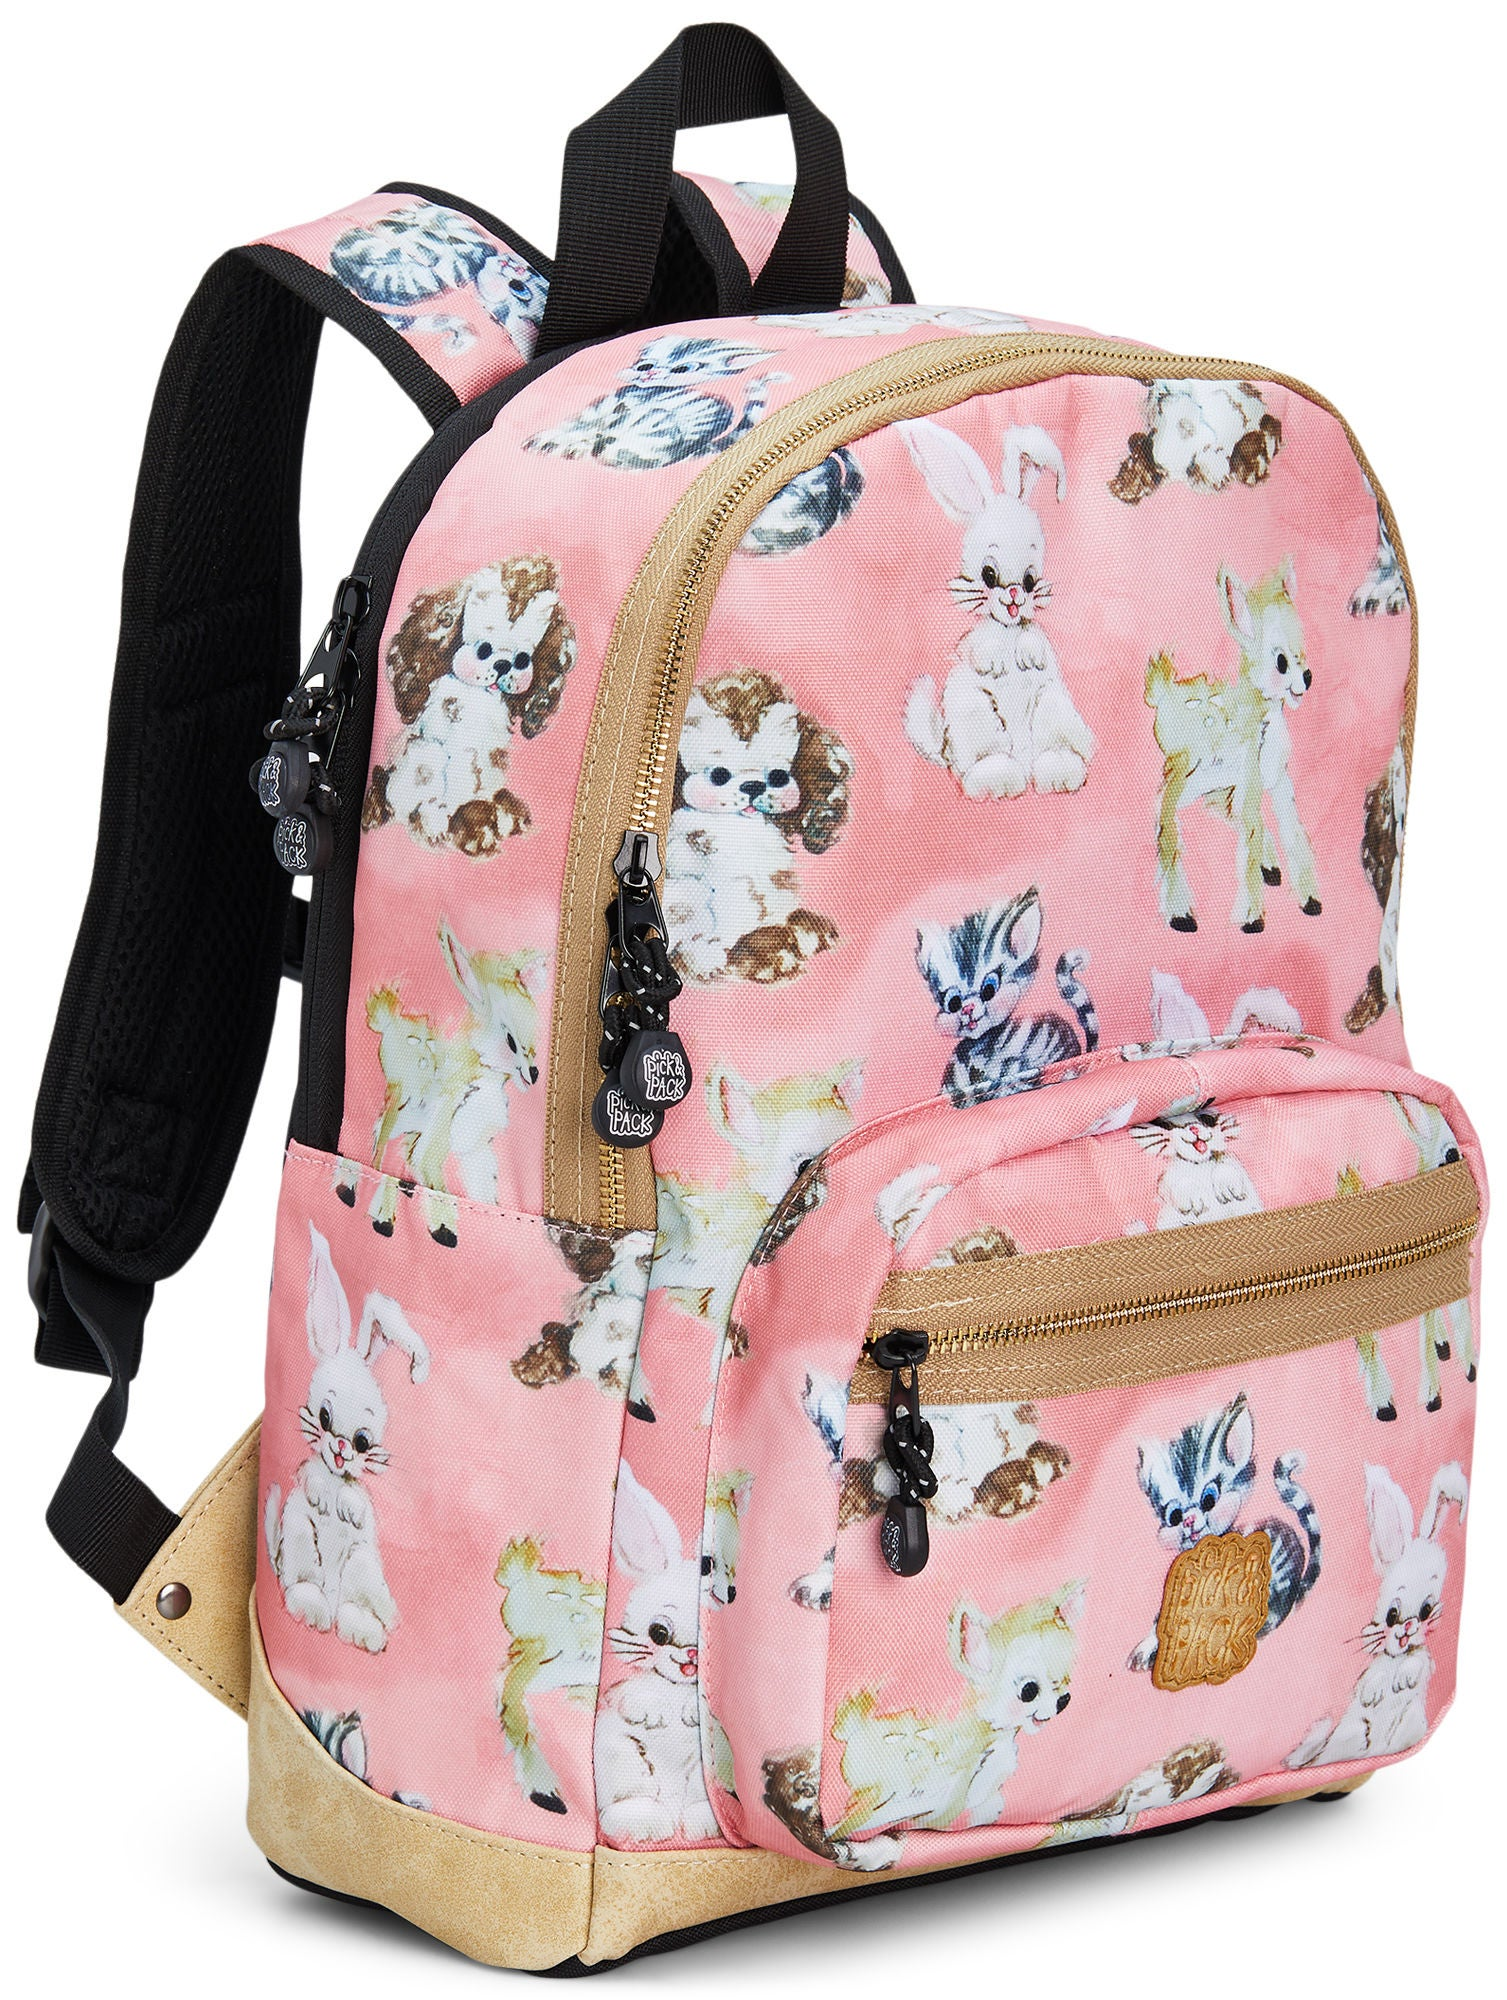 Pick & Pack Ryggsäck Cute Animals, Pink